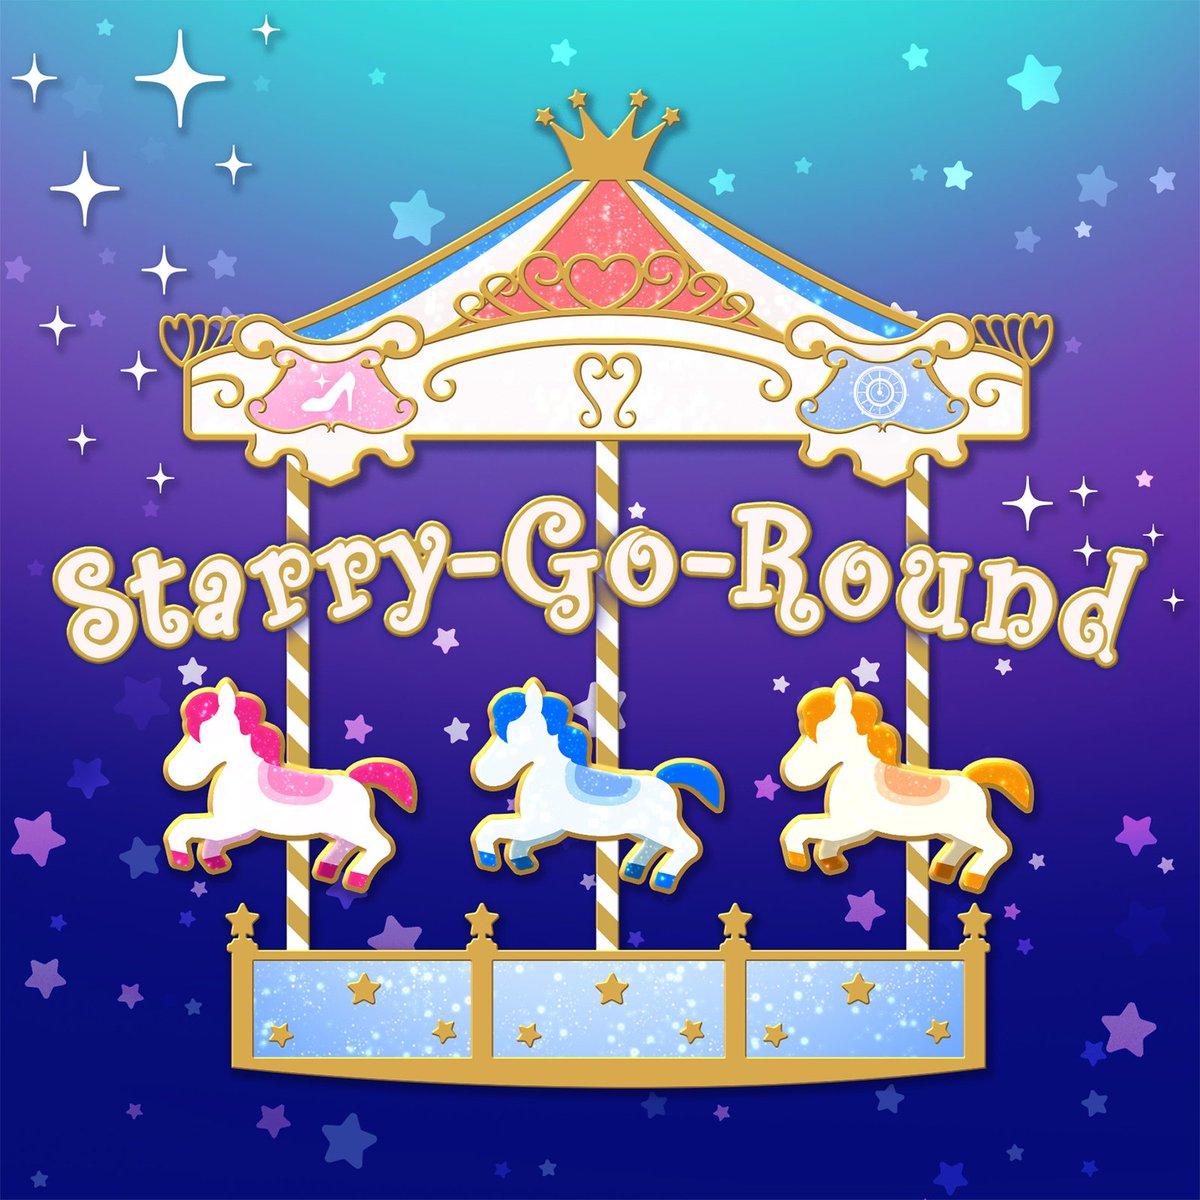 test ツイッターメディア - #nowplaying Starry-Go-Round (M@STER VERSION) 44.1kHz/16bit by 前川みく (CV: 高森奈津美)、大槻唯 (CV: 山下七海)、アナスタシア (CV: 上坂すみれ)、姫川友紀 (CV: 杜野まこ)、二宮飛鳥 (CV: 青木志貴) on #onkyo #hfplayer https://t.co/rMu19XXVyP